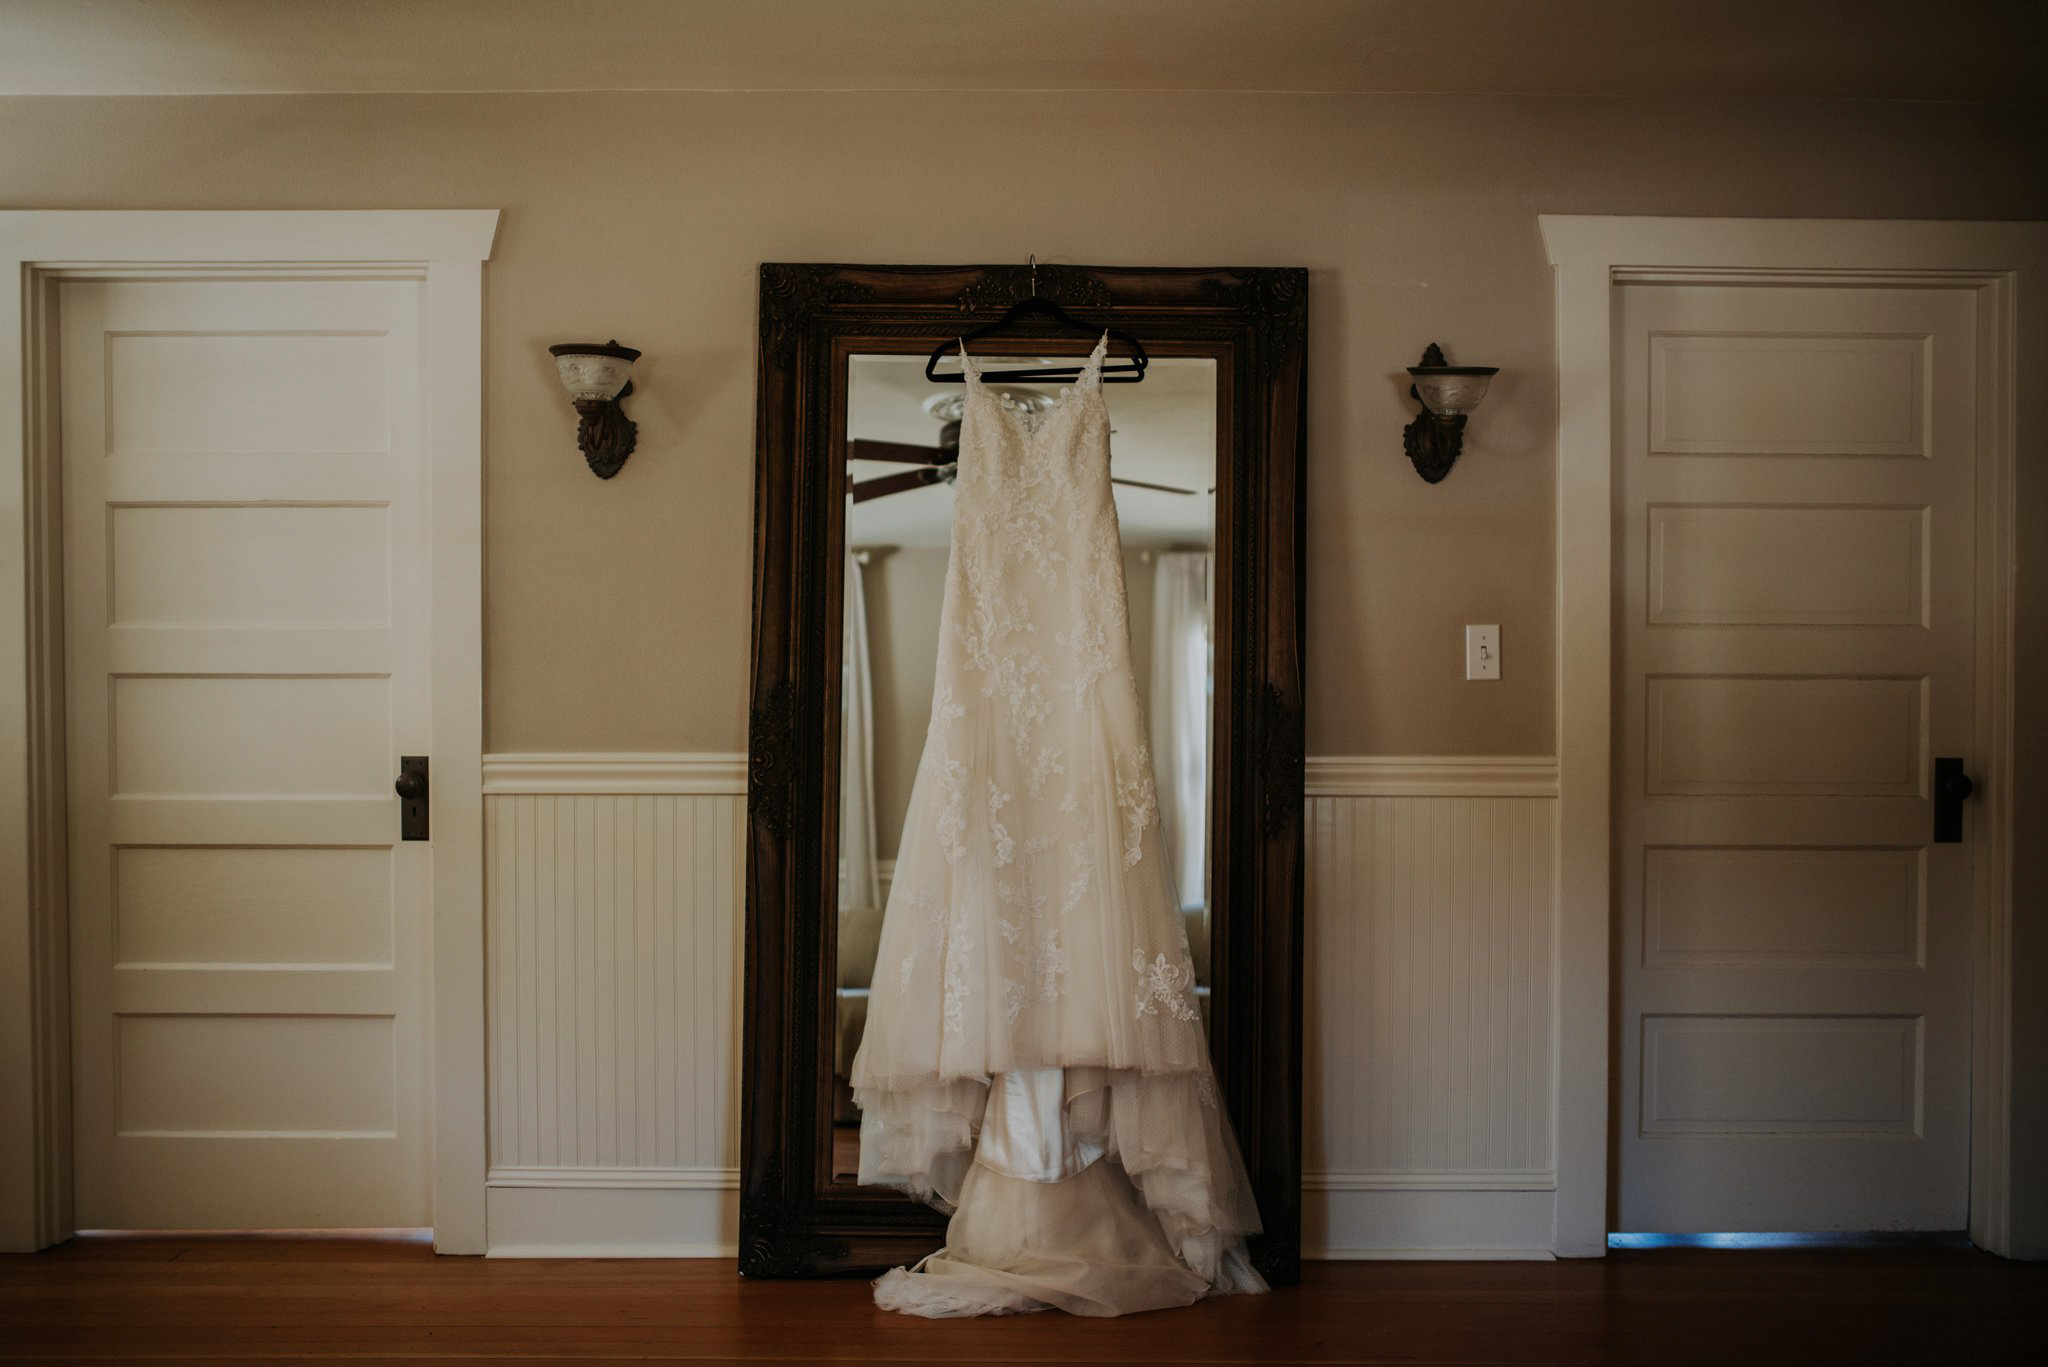 kristen-and-cody-the-kelley-farm-wedding-seattle-photographer-caitlyn-nikula-1.jpg